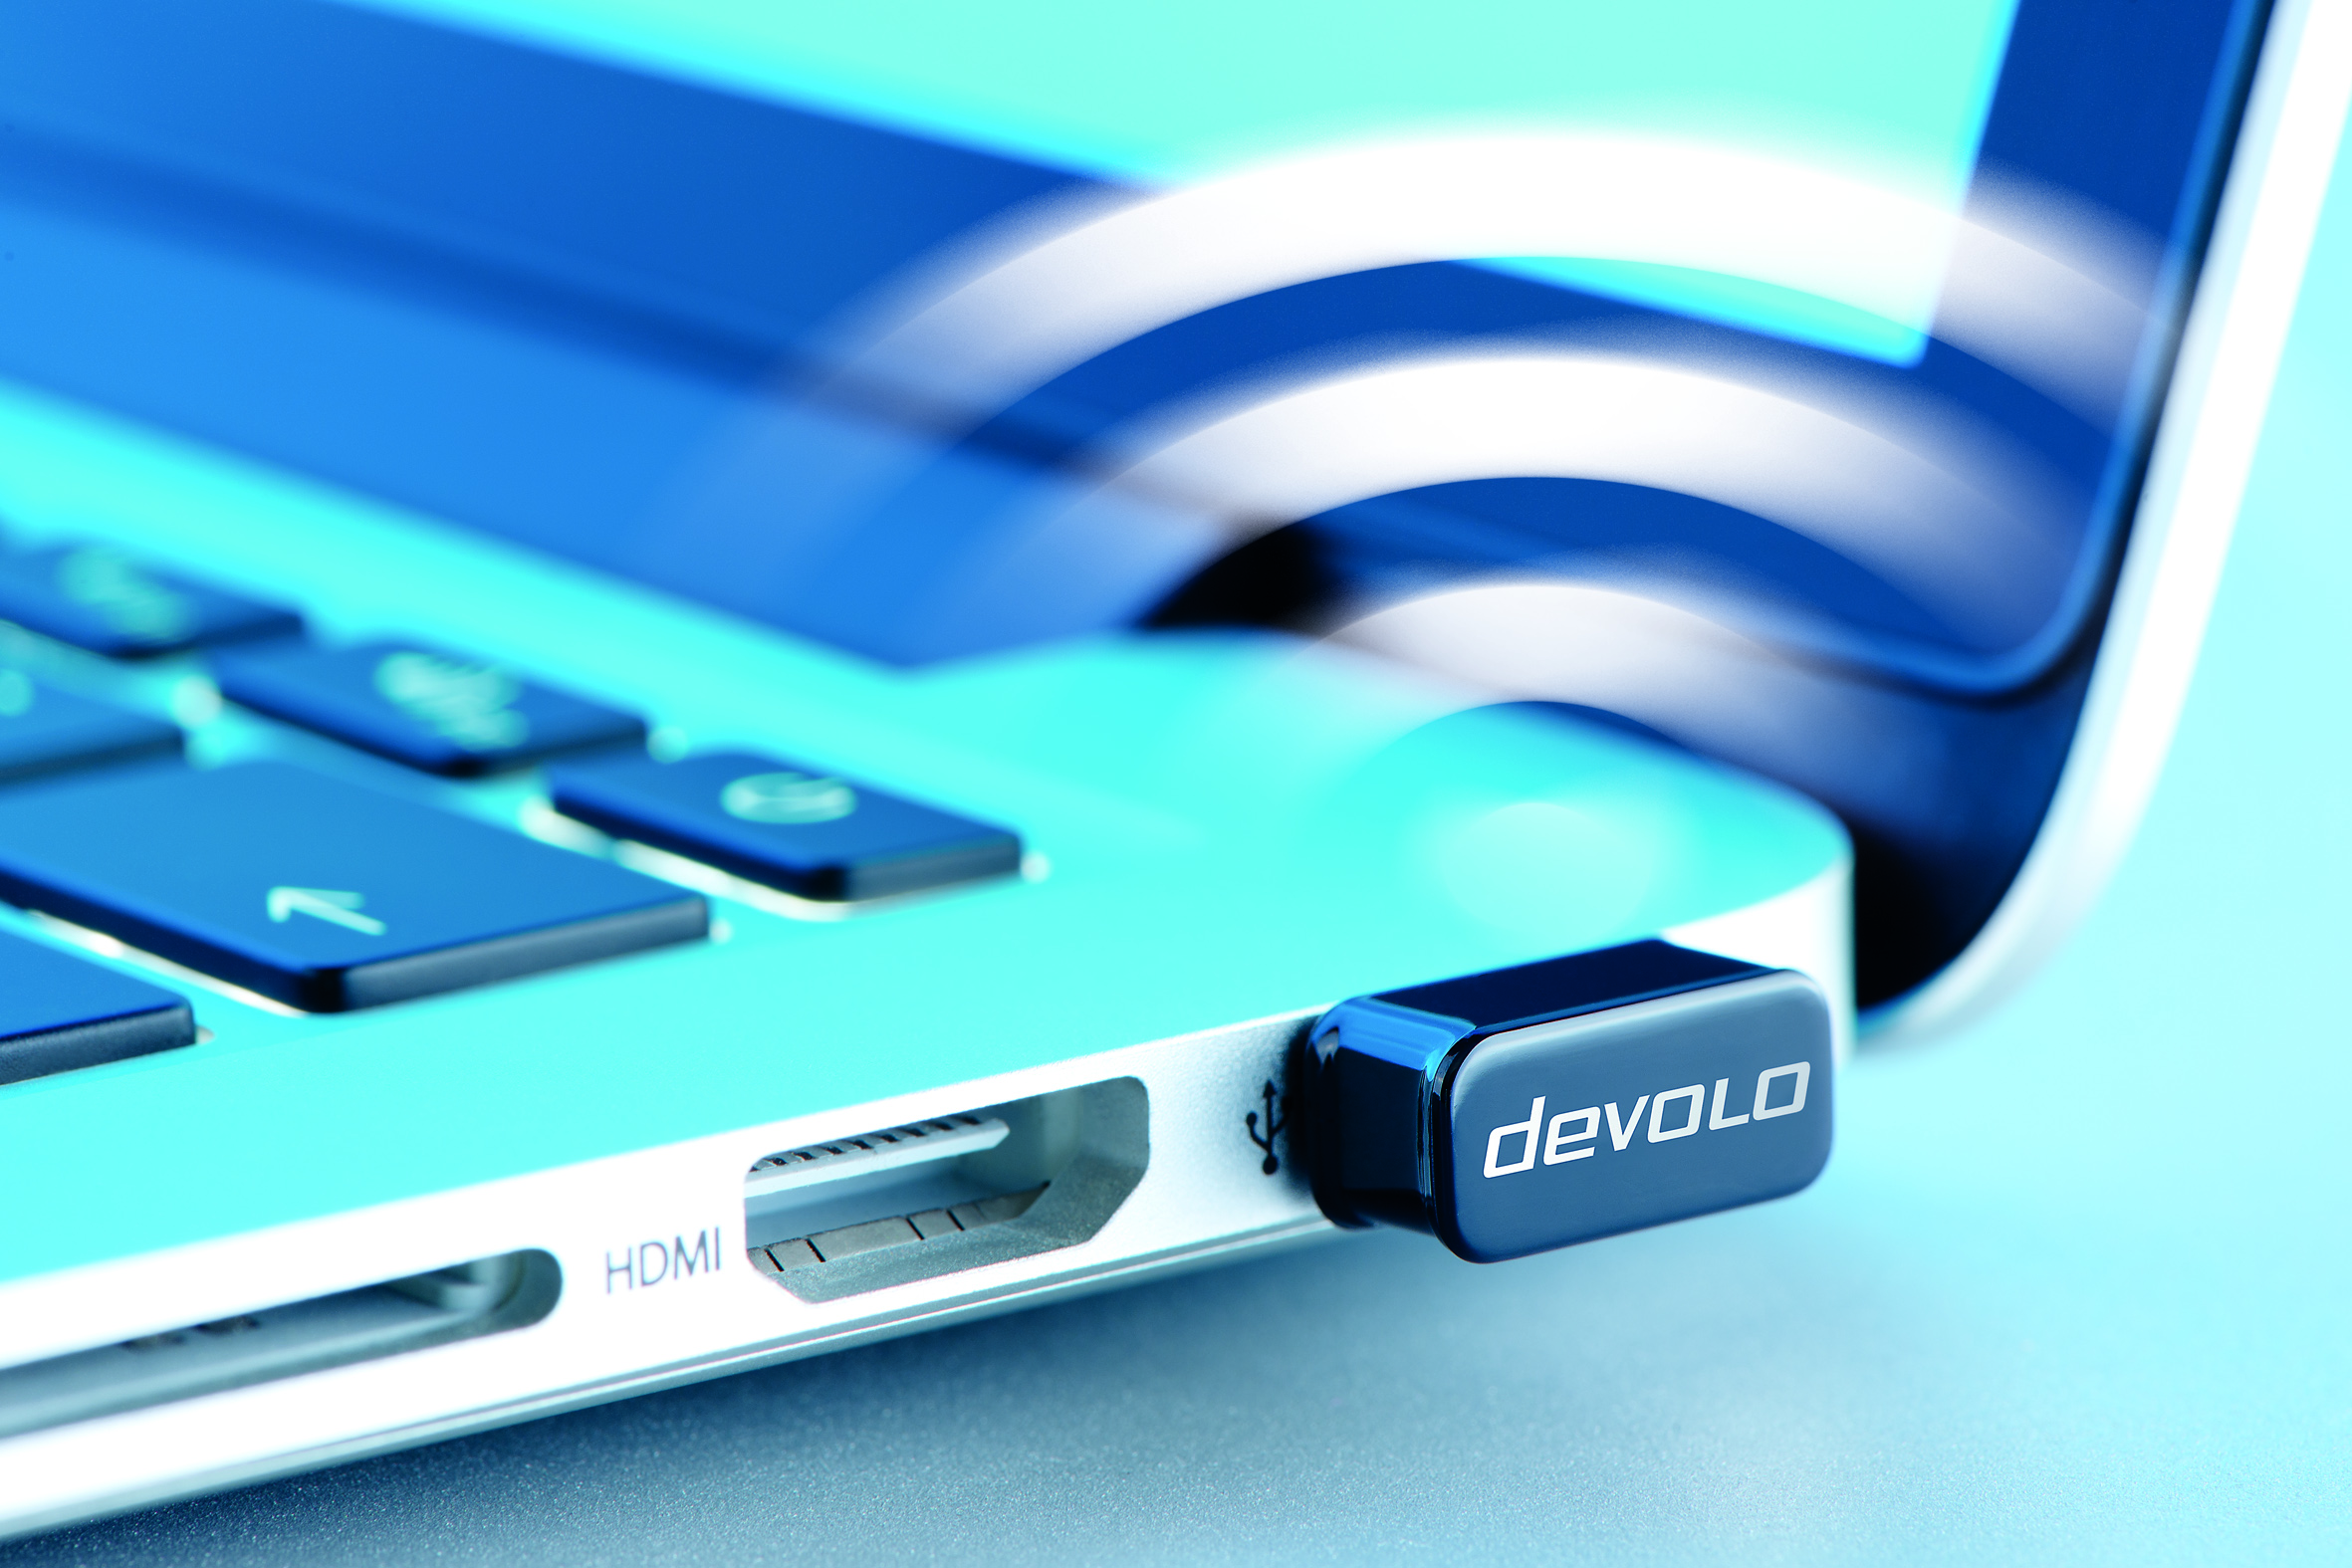 dLAN_WiFiac_USB_stick_closeup_A_print_01